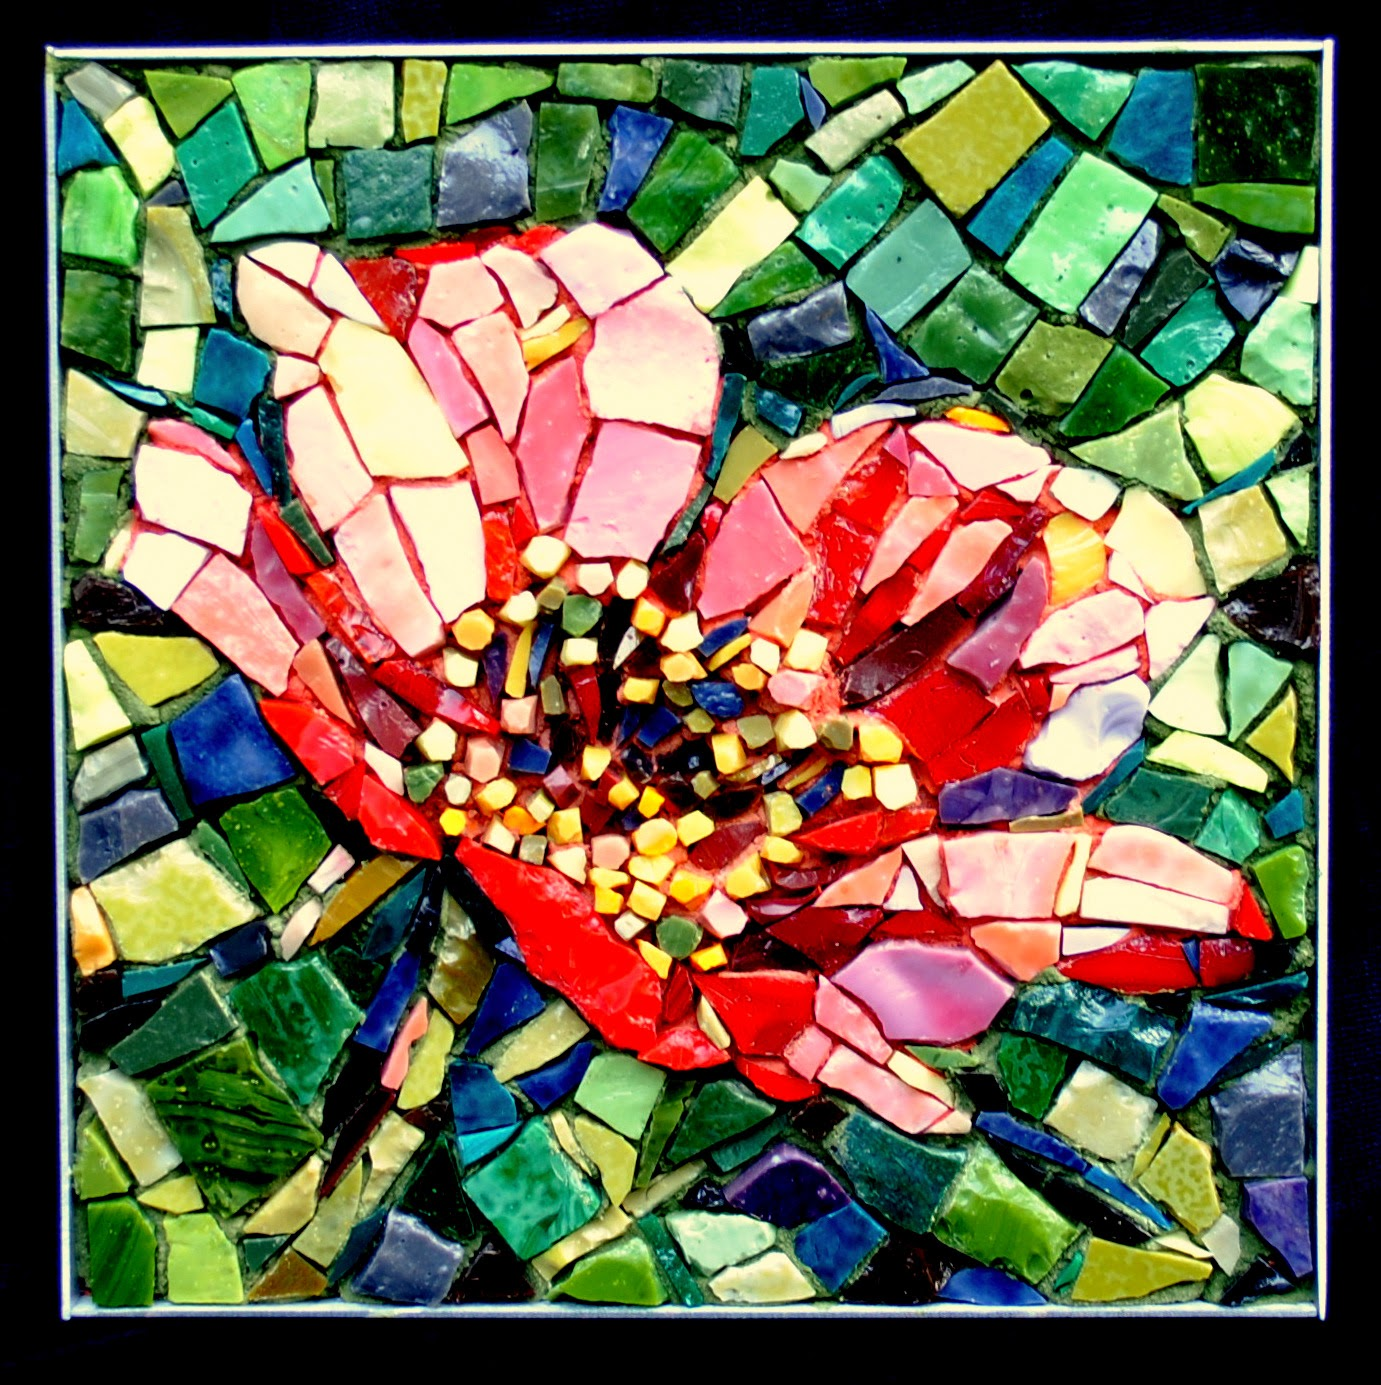 Kew Gardens Rose by Brenda Pokorny